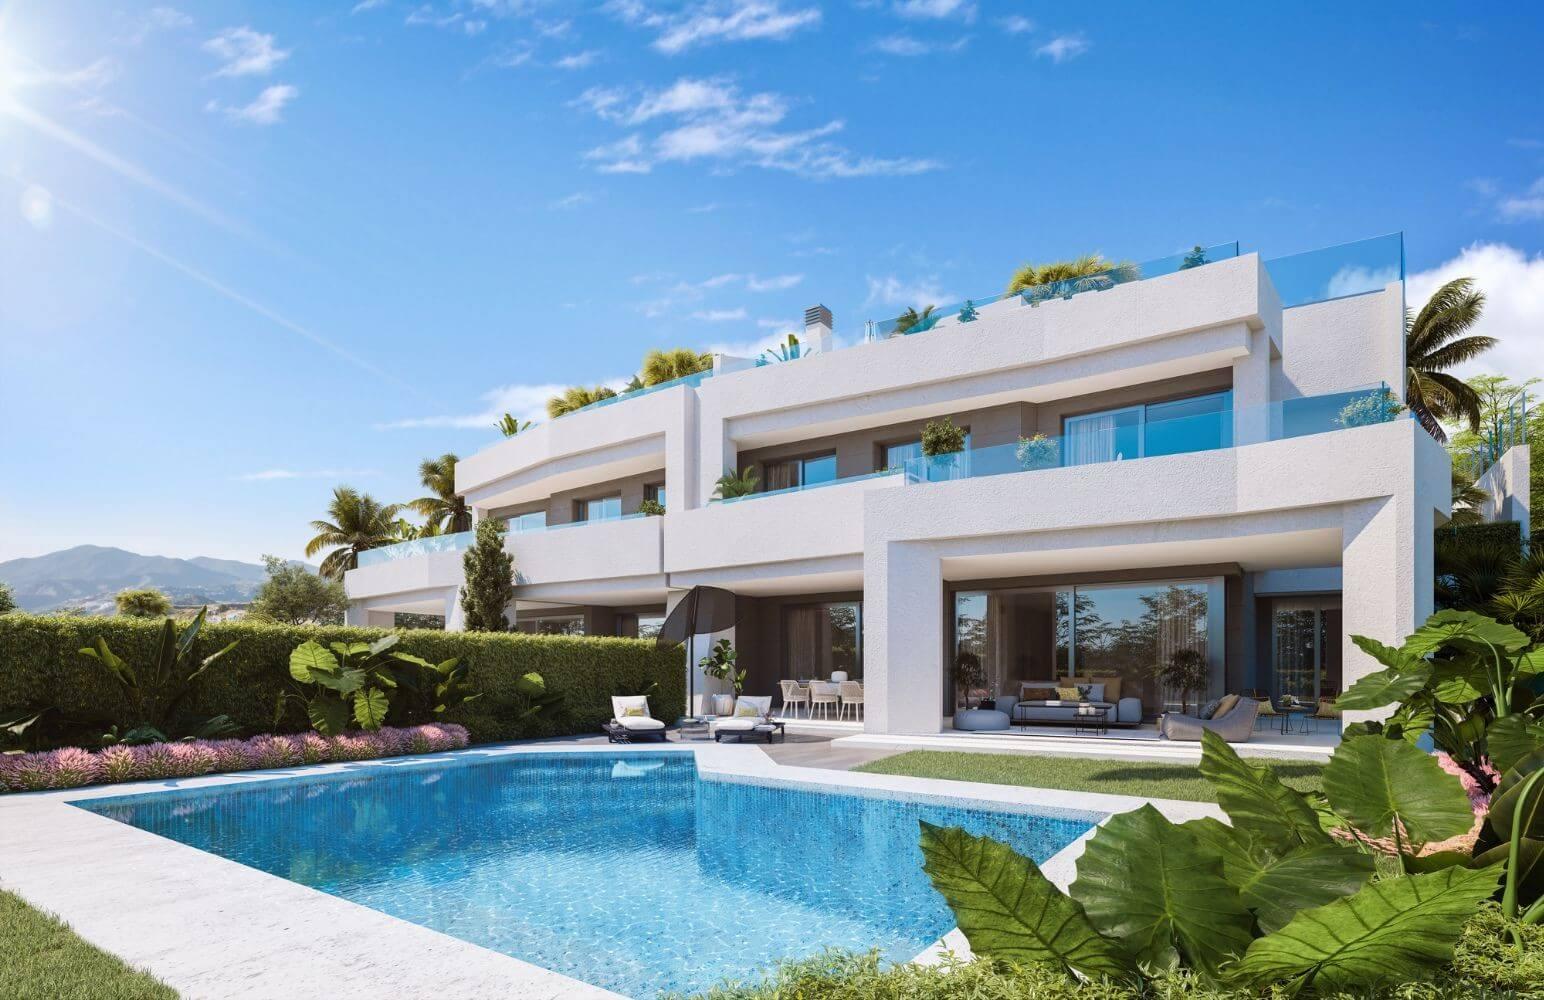 soul marbella sunset santa clara golf costa del sol huis te koop spanje modern zeezicht prive zwembad